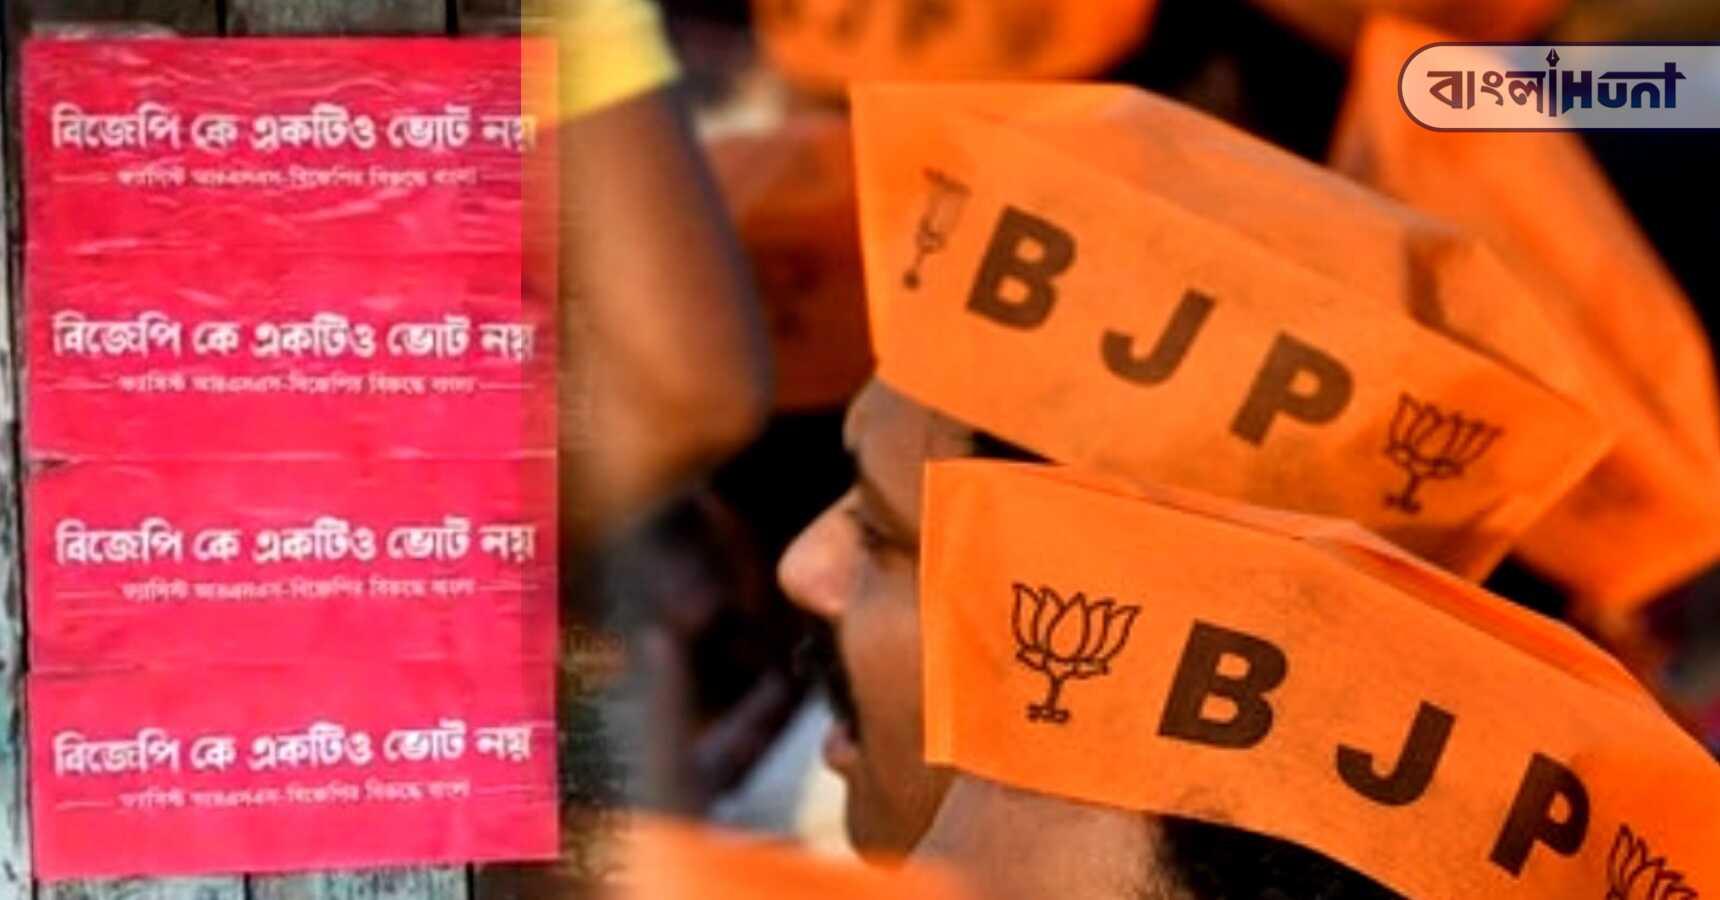 'No vote for BJP' - Siliguri covered anti-BJP posters